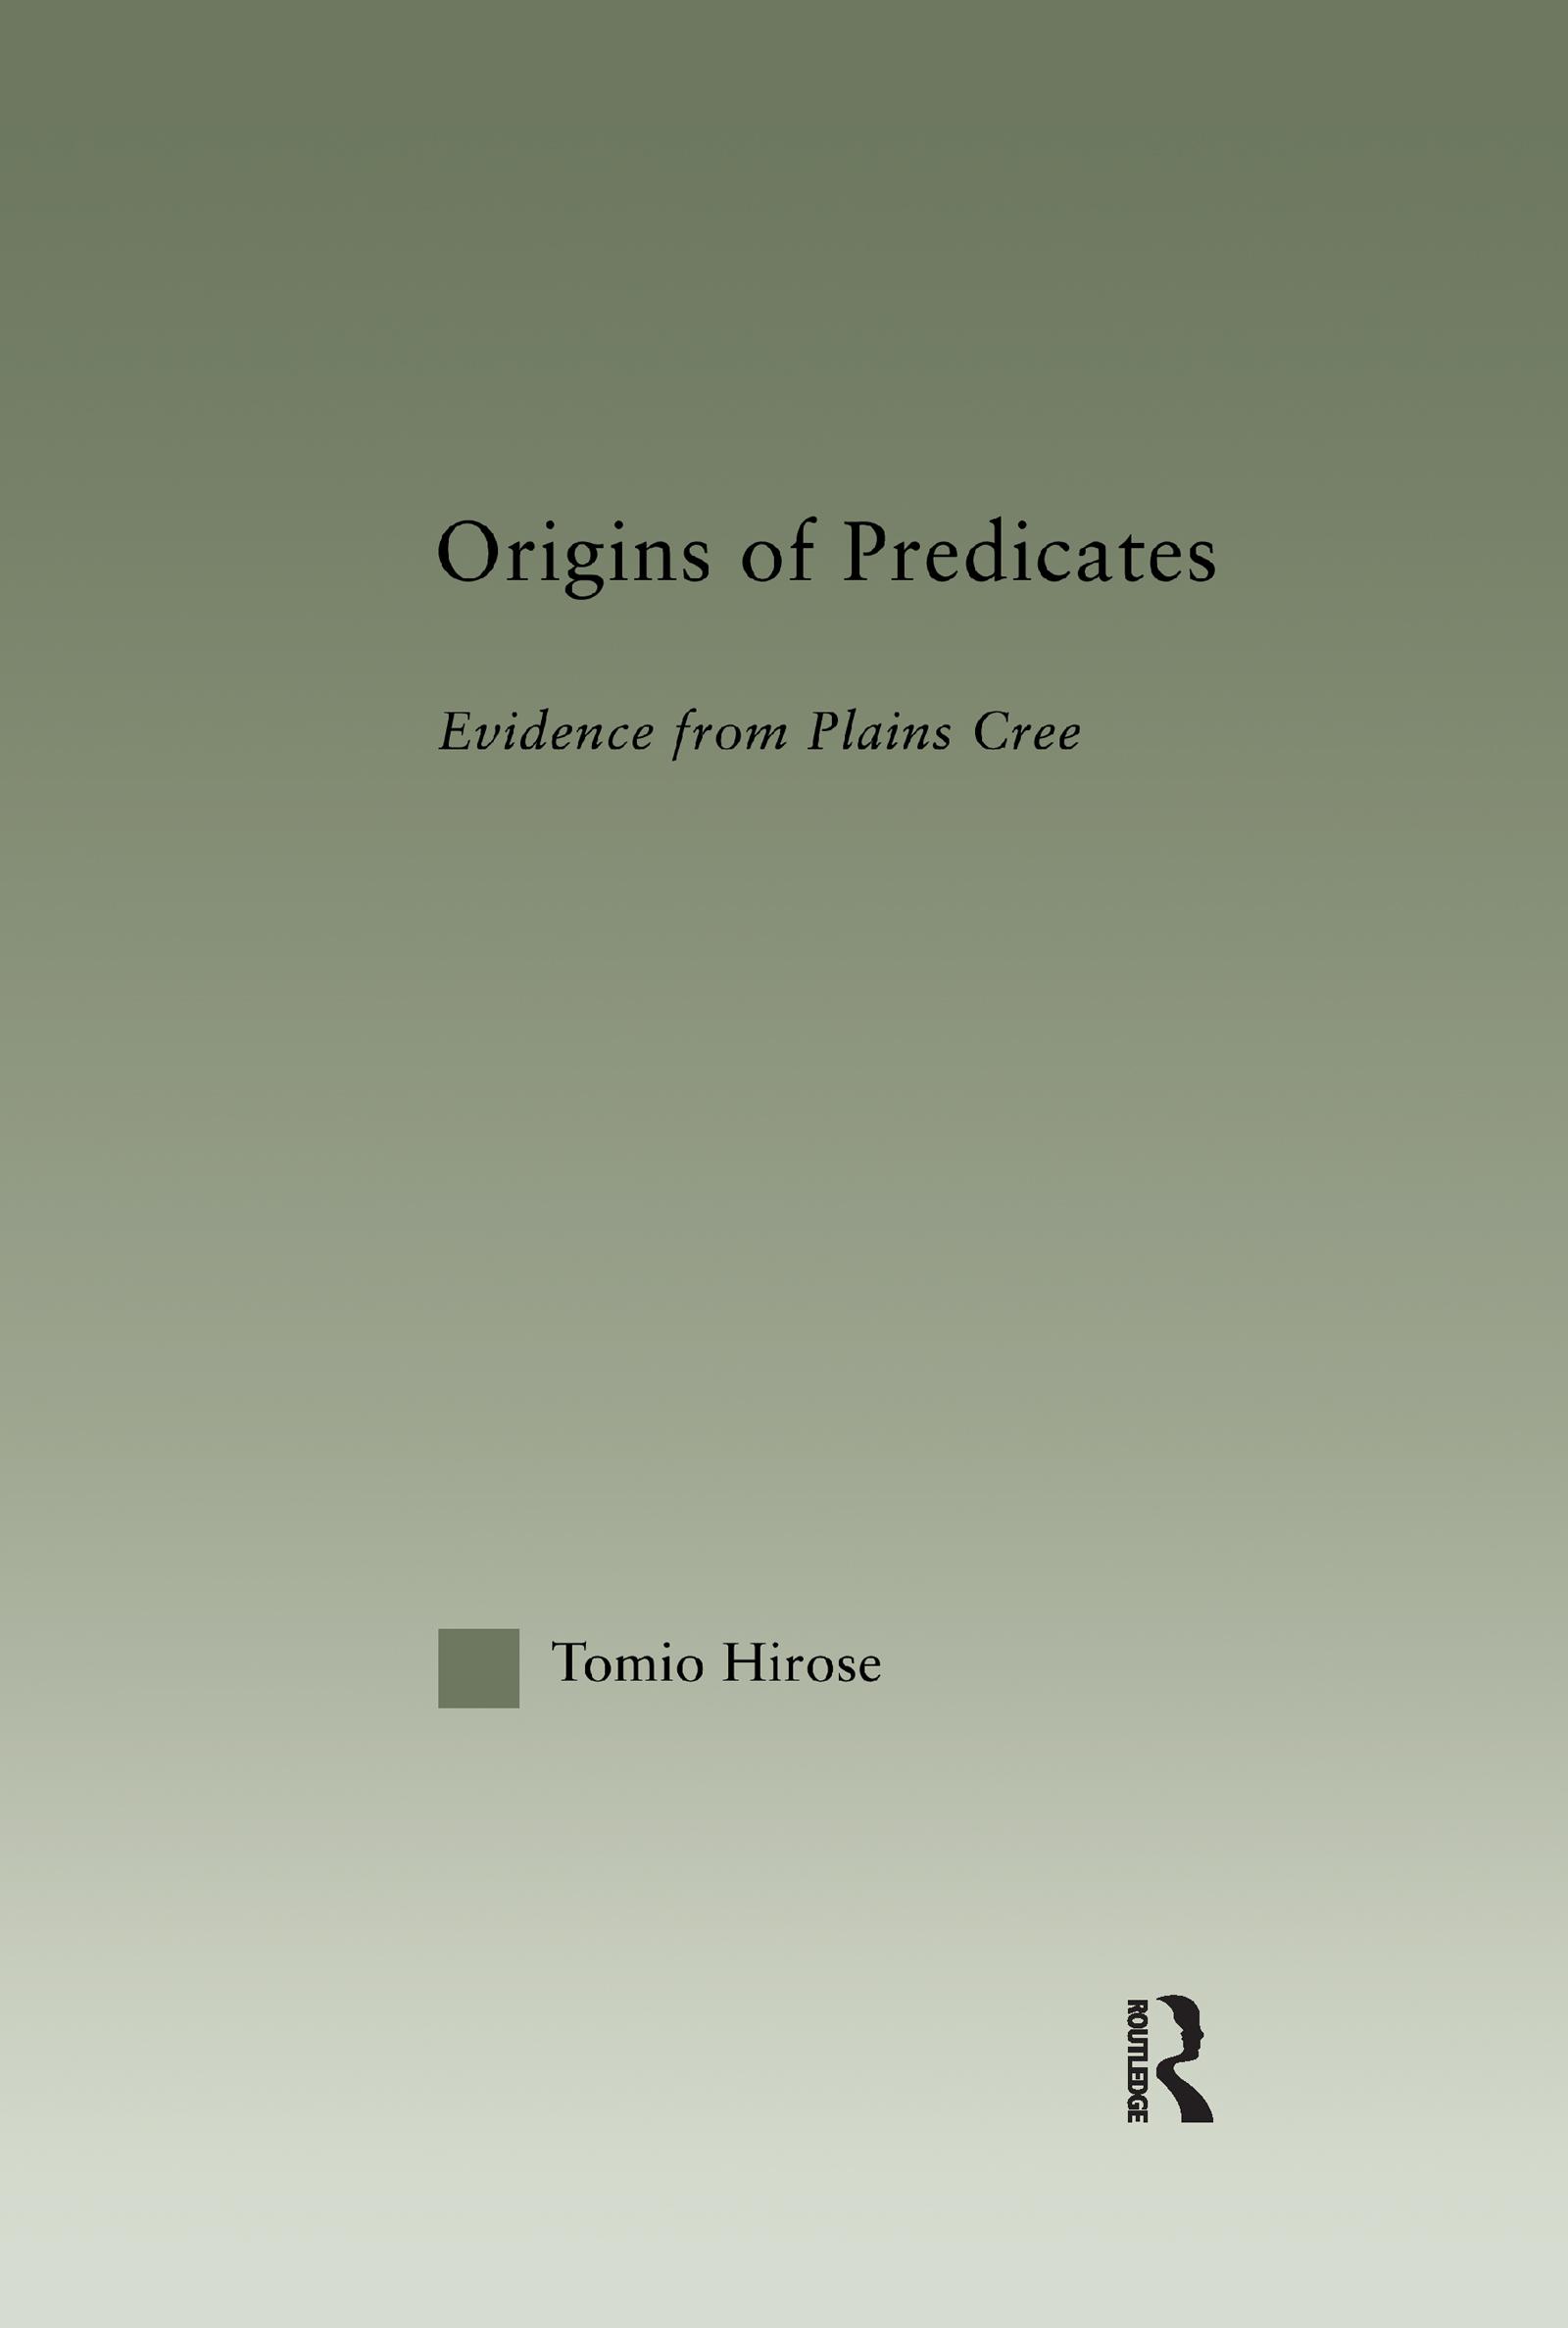 Origins of Predicates